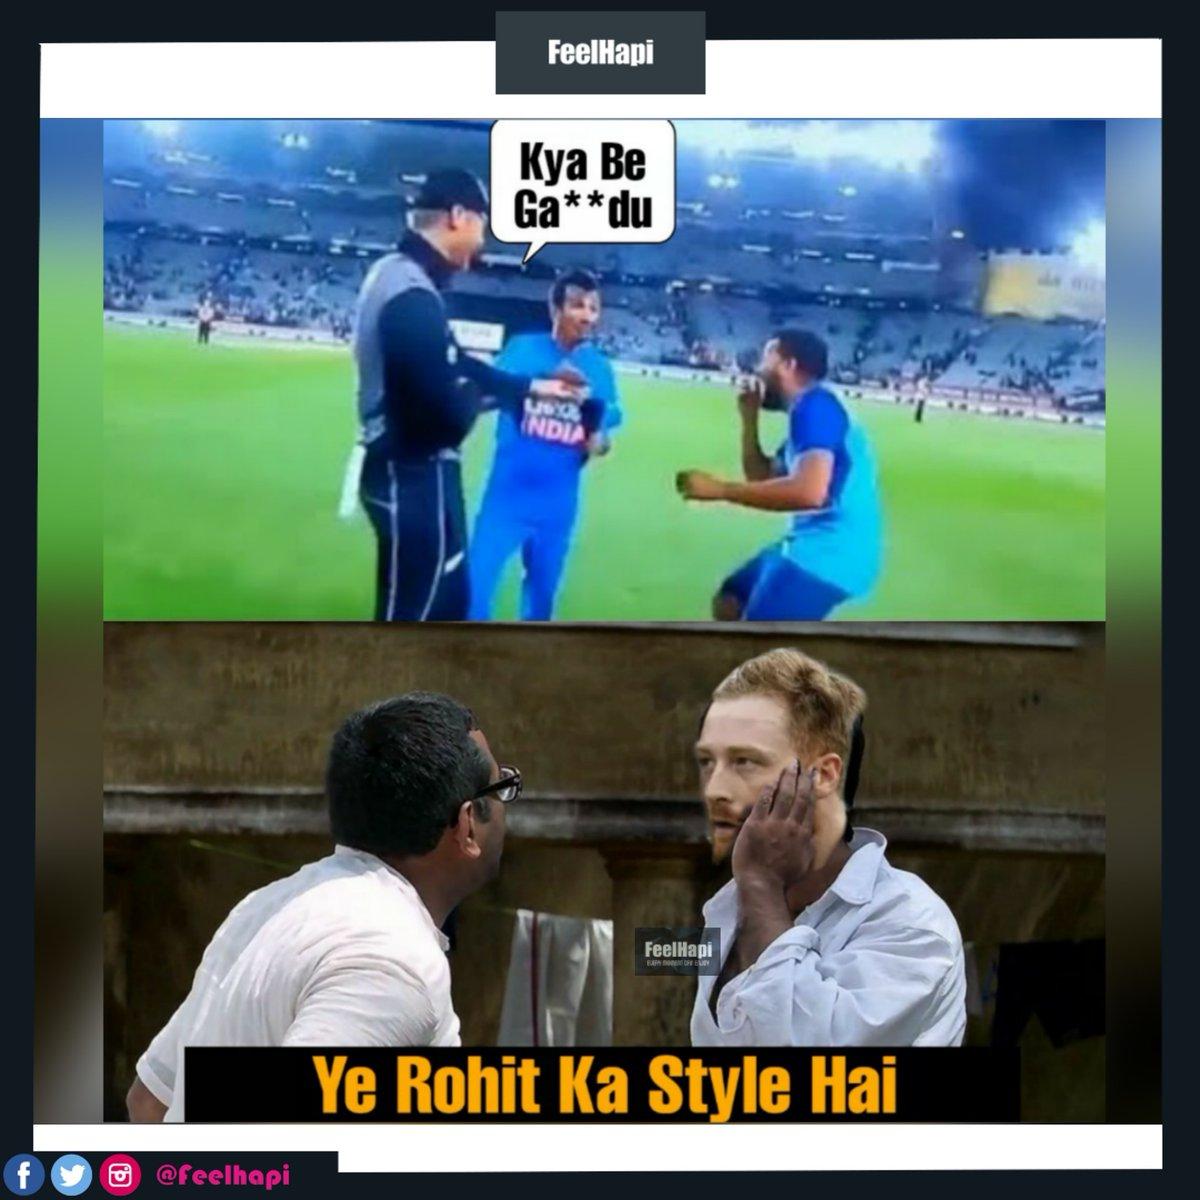 Kya Be Ga**du😂😂😂 . . #feelhapi #guptill  #kyabegandu #rohitsharma #chahal #cricket #indvsnz #funny #memes #meme #funnymemes #lol #dankmemes #comedy #fun #love #follow #memesdaily #like #humor #funnyvideos #instagram #cute #haha #laugh #instagood #jokes #copycat